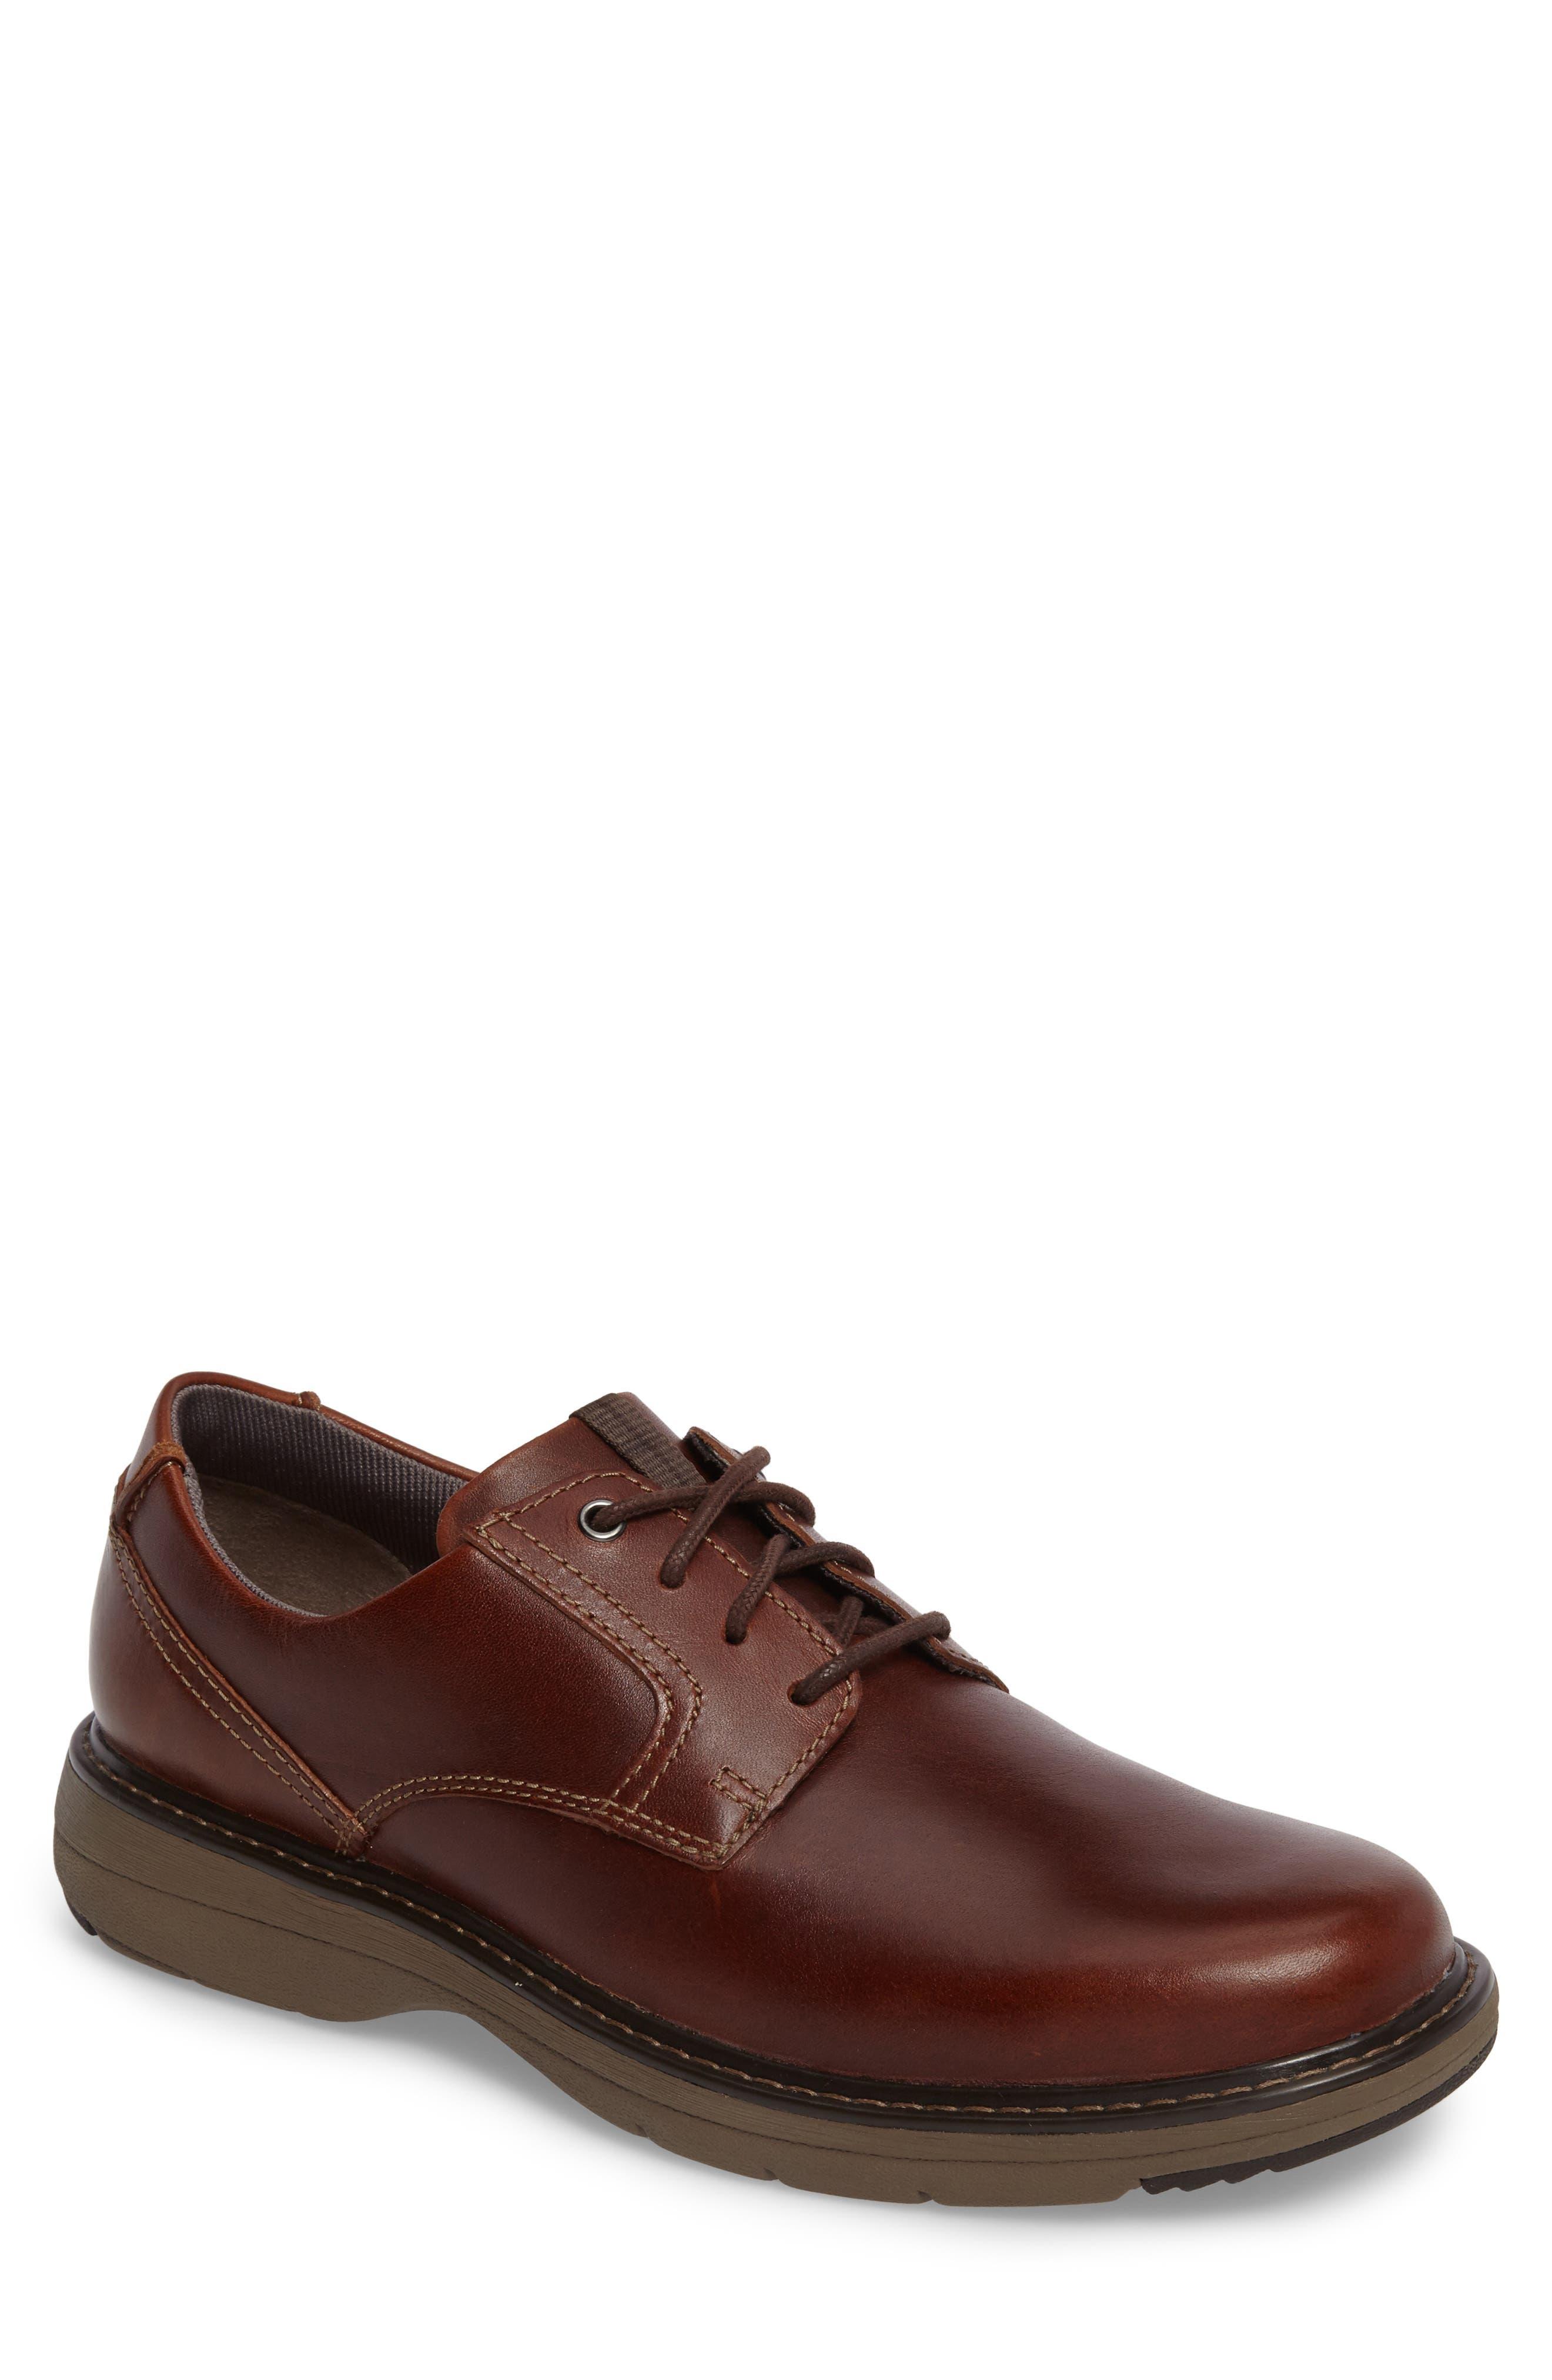 Cushox Plain Toe Derby,                         Main,                         color, Dark Tan Leather